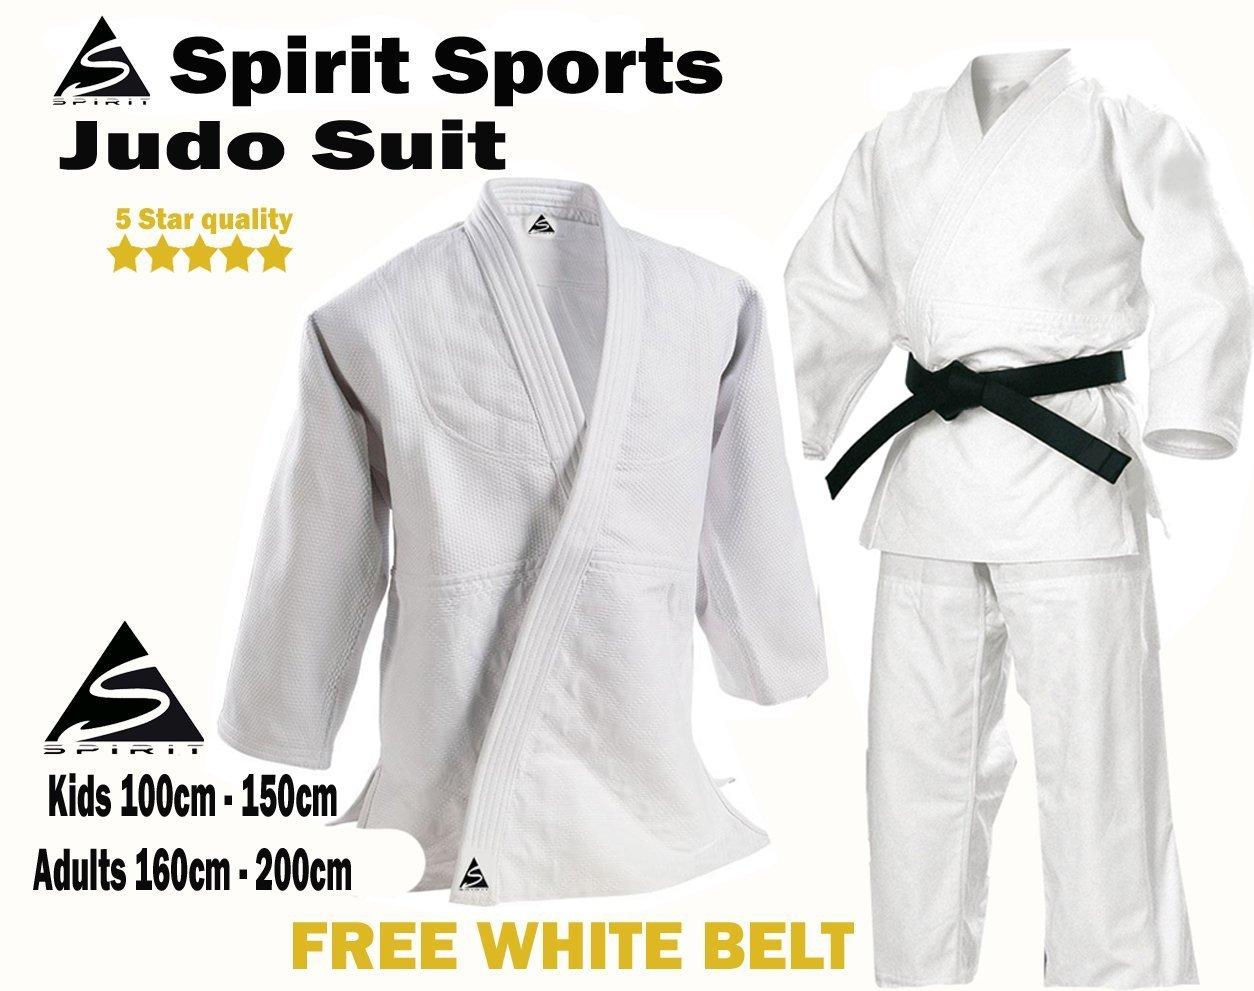 Spirit Sports Judo Entrenamiento Uniforme 550 grm 100% algodón ...